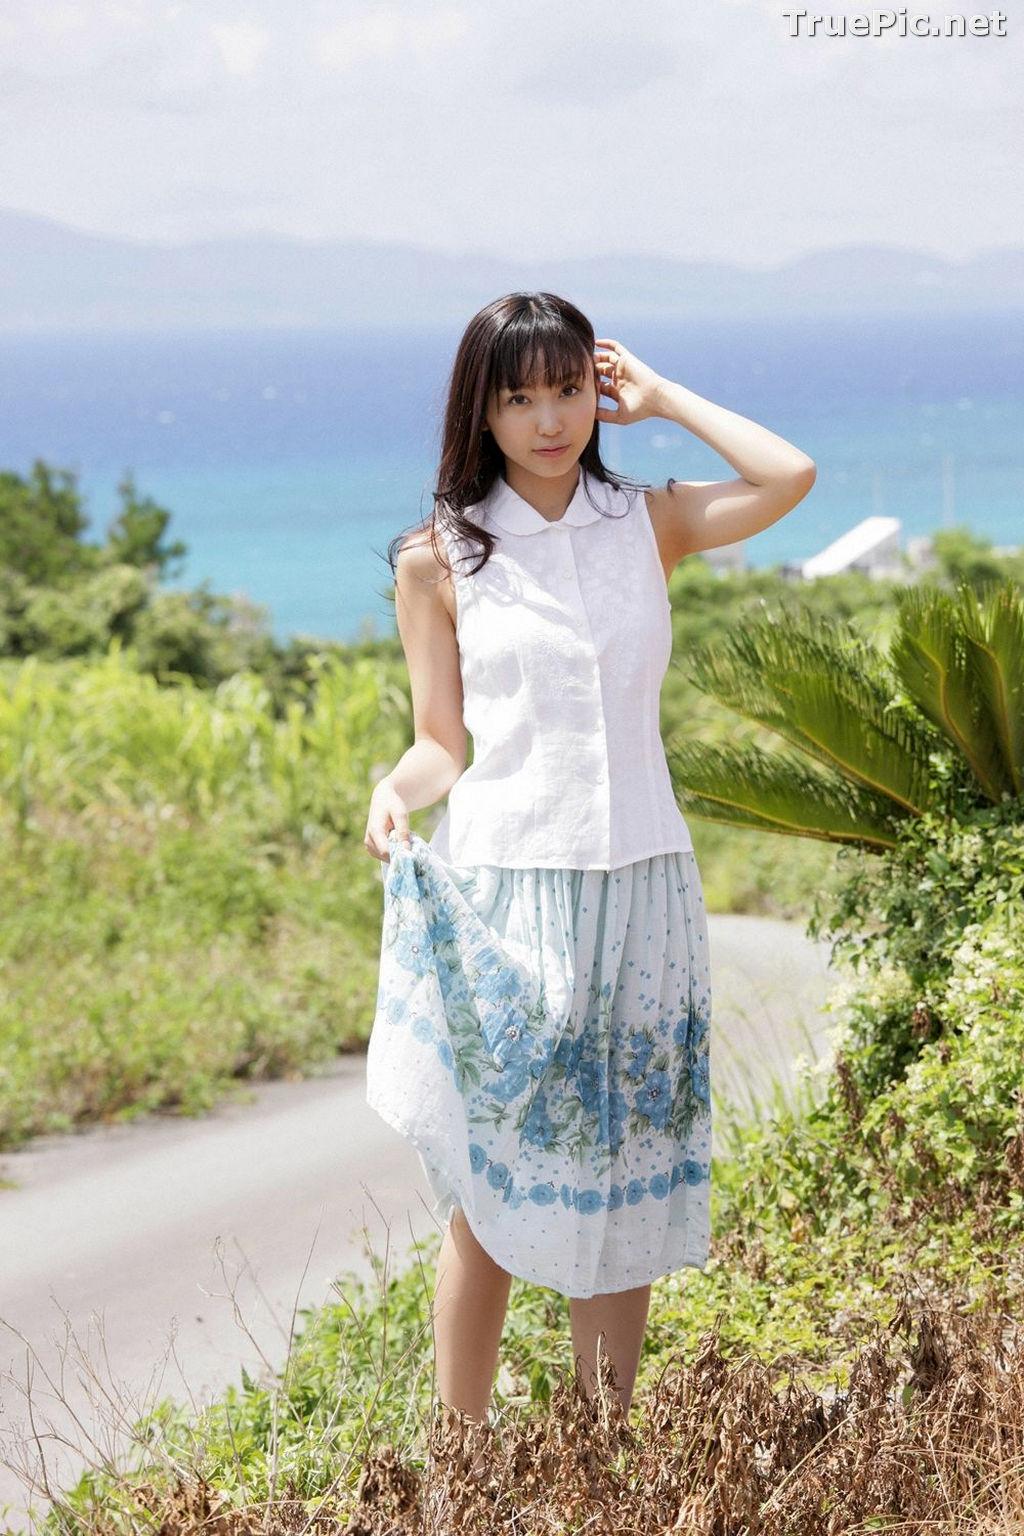 Image [YS Web] Vol.527 - Japanese Gravure Idol and Singer - Risa Yoshiki - TruePic.net - Picture-1